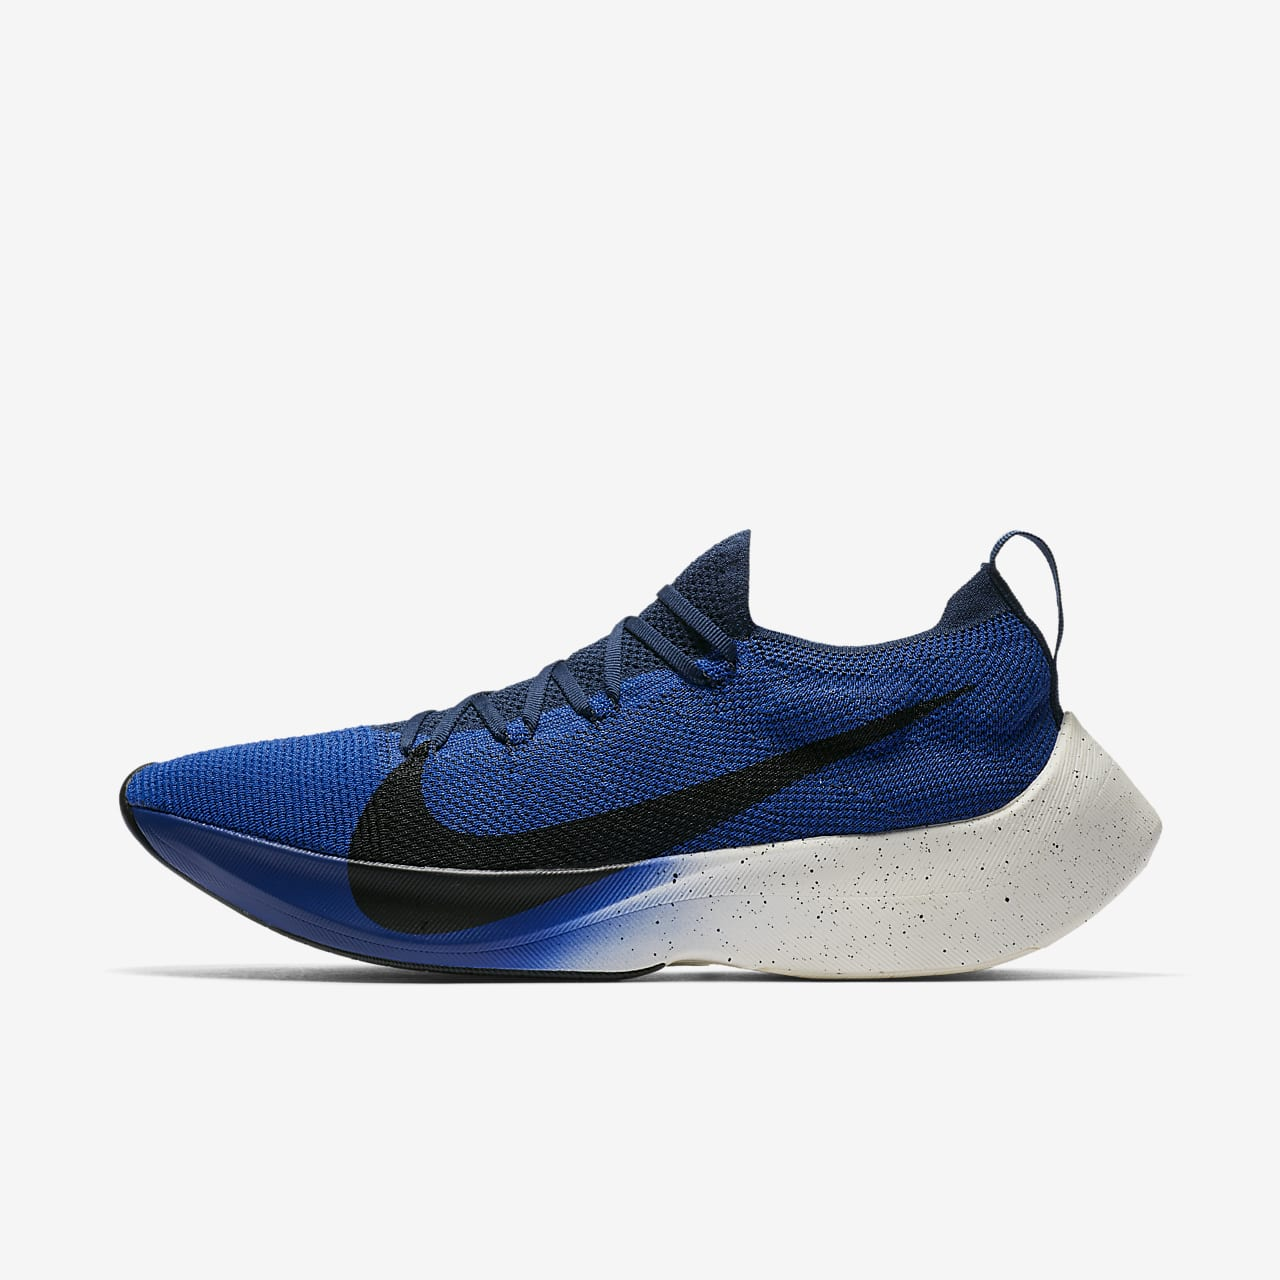 Nike React Vapor Street Flyknit Men's